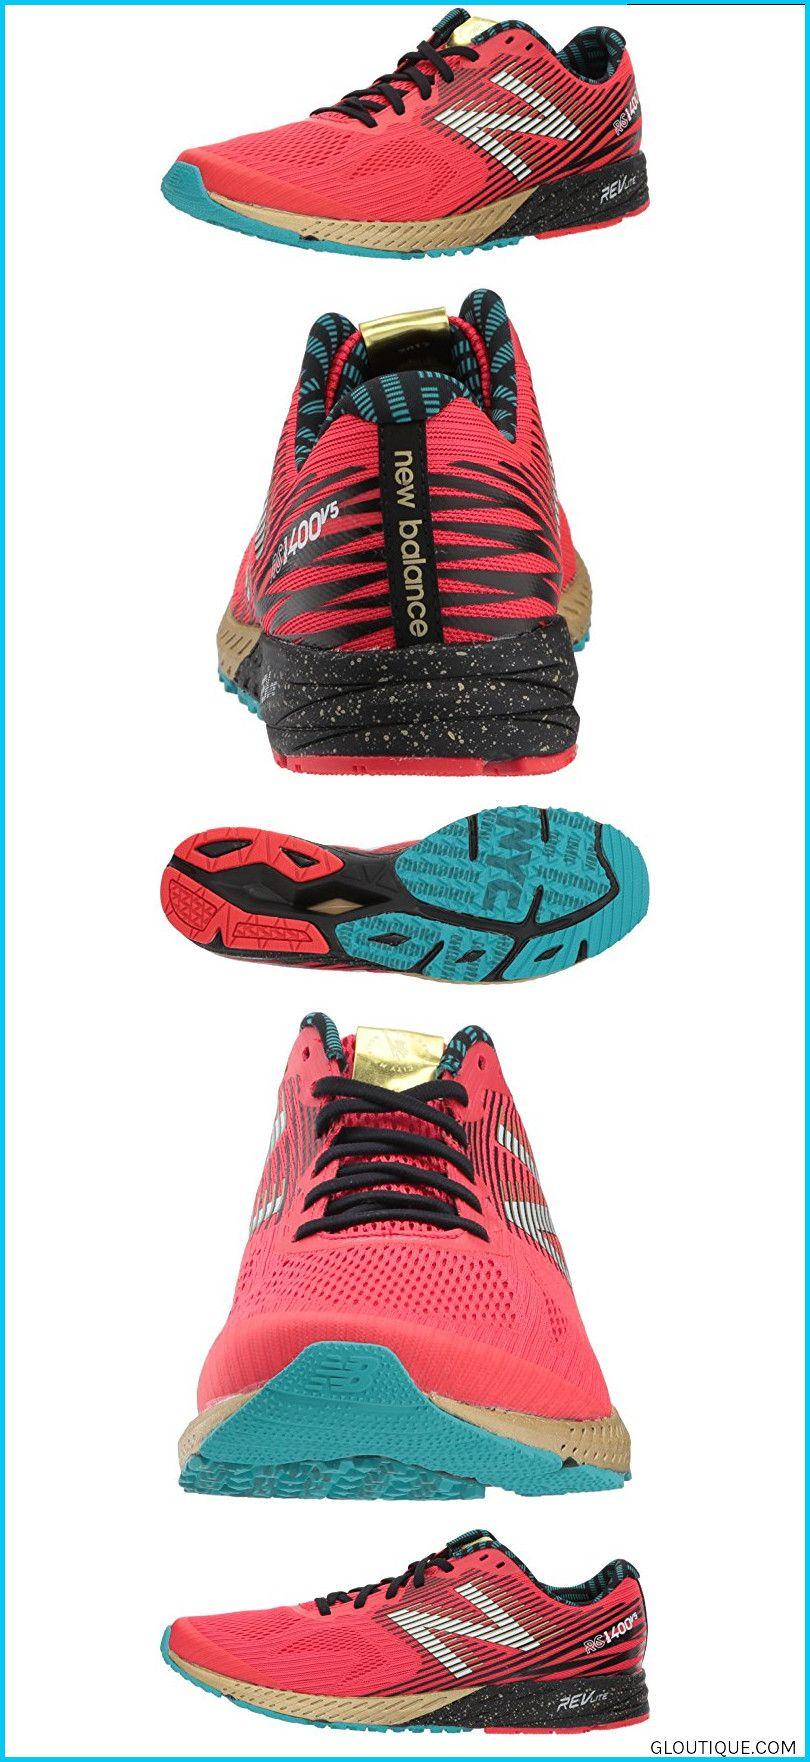 reputable site 74648 d8db3 New Balance Men's NYC 1400v5 Running Shoe | Men Athletic ...